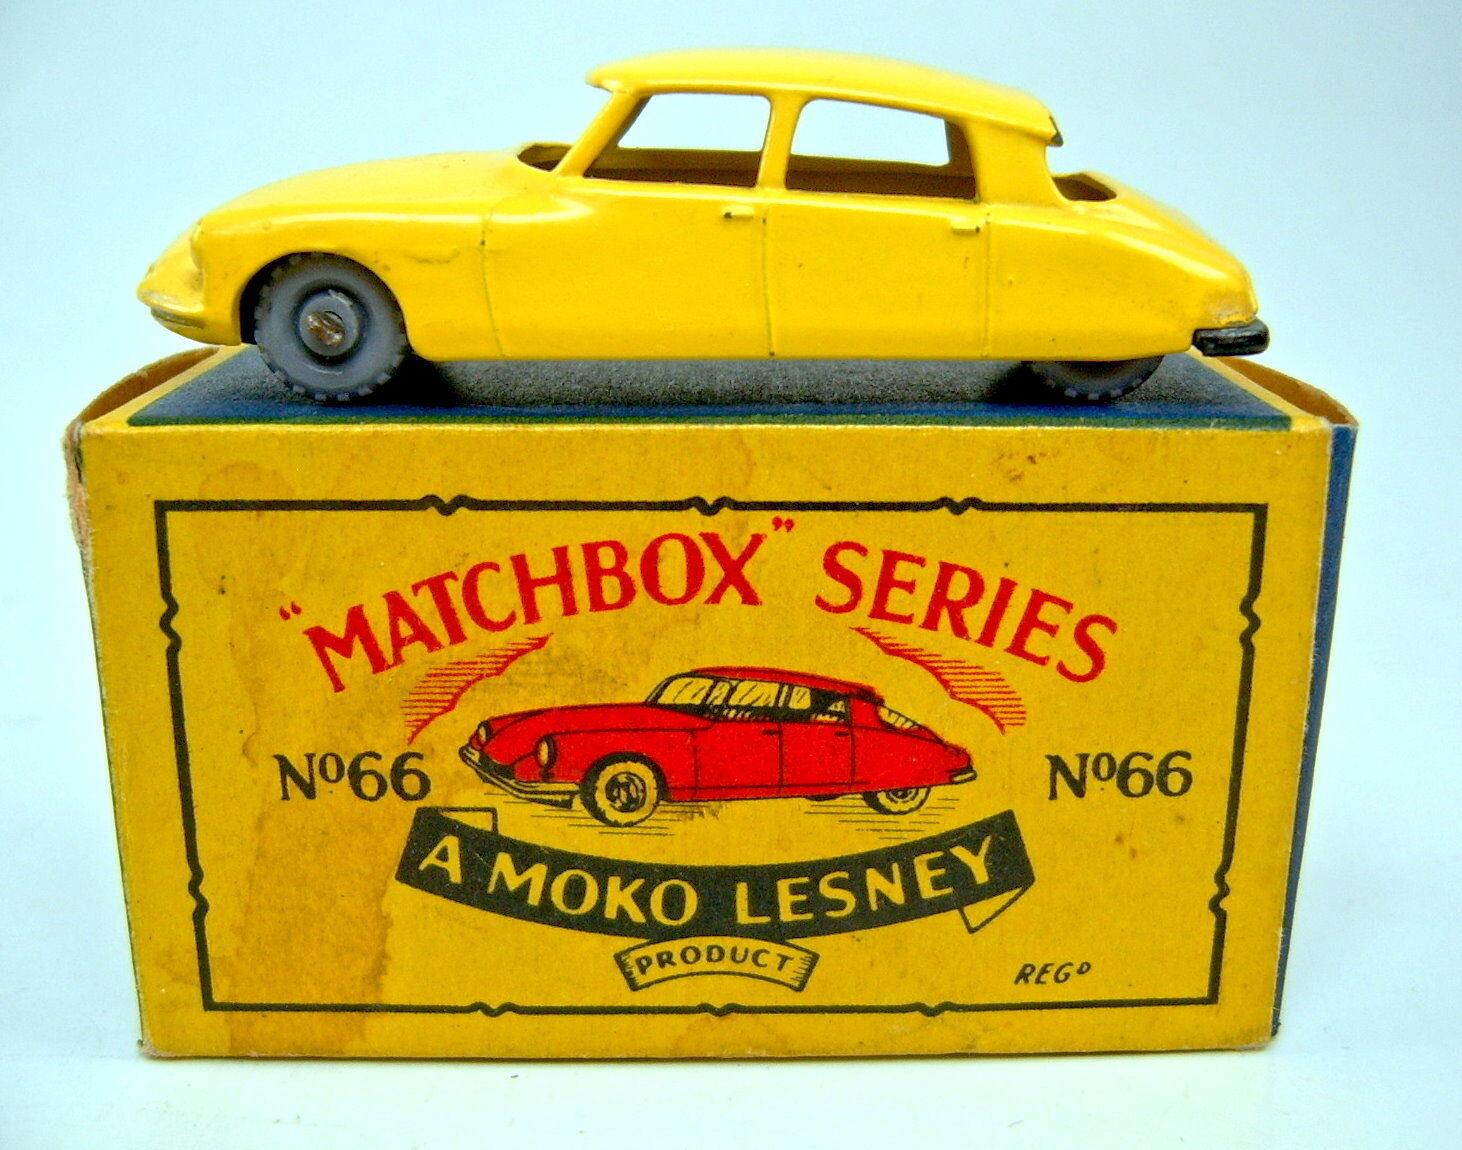 MATCHBOX MATCHBOX MATCHBOX RW 66a CITROEN DS GIALLO RARE 1. stampo in  Moko  BOX 3ff2f4